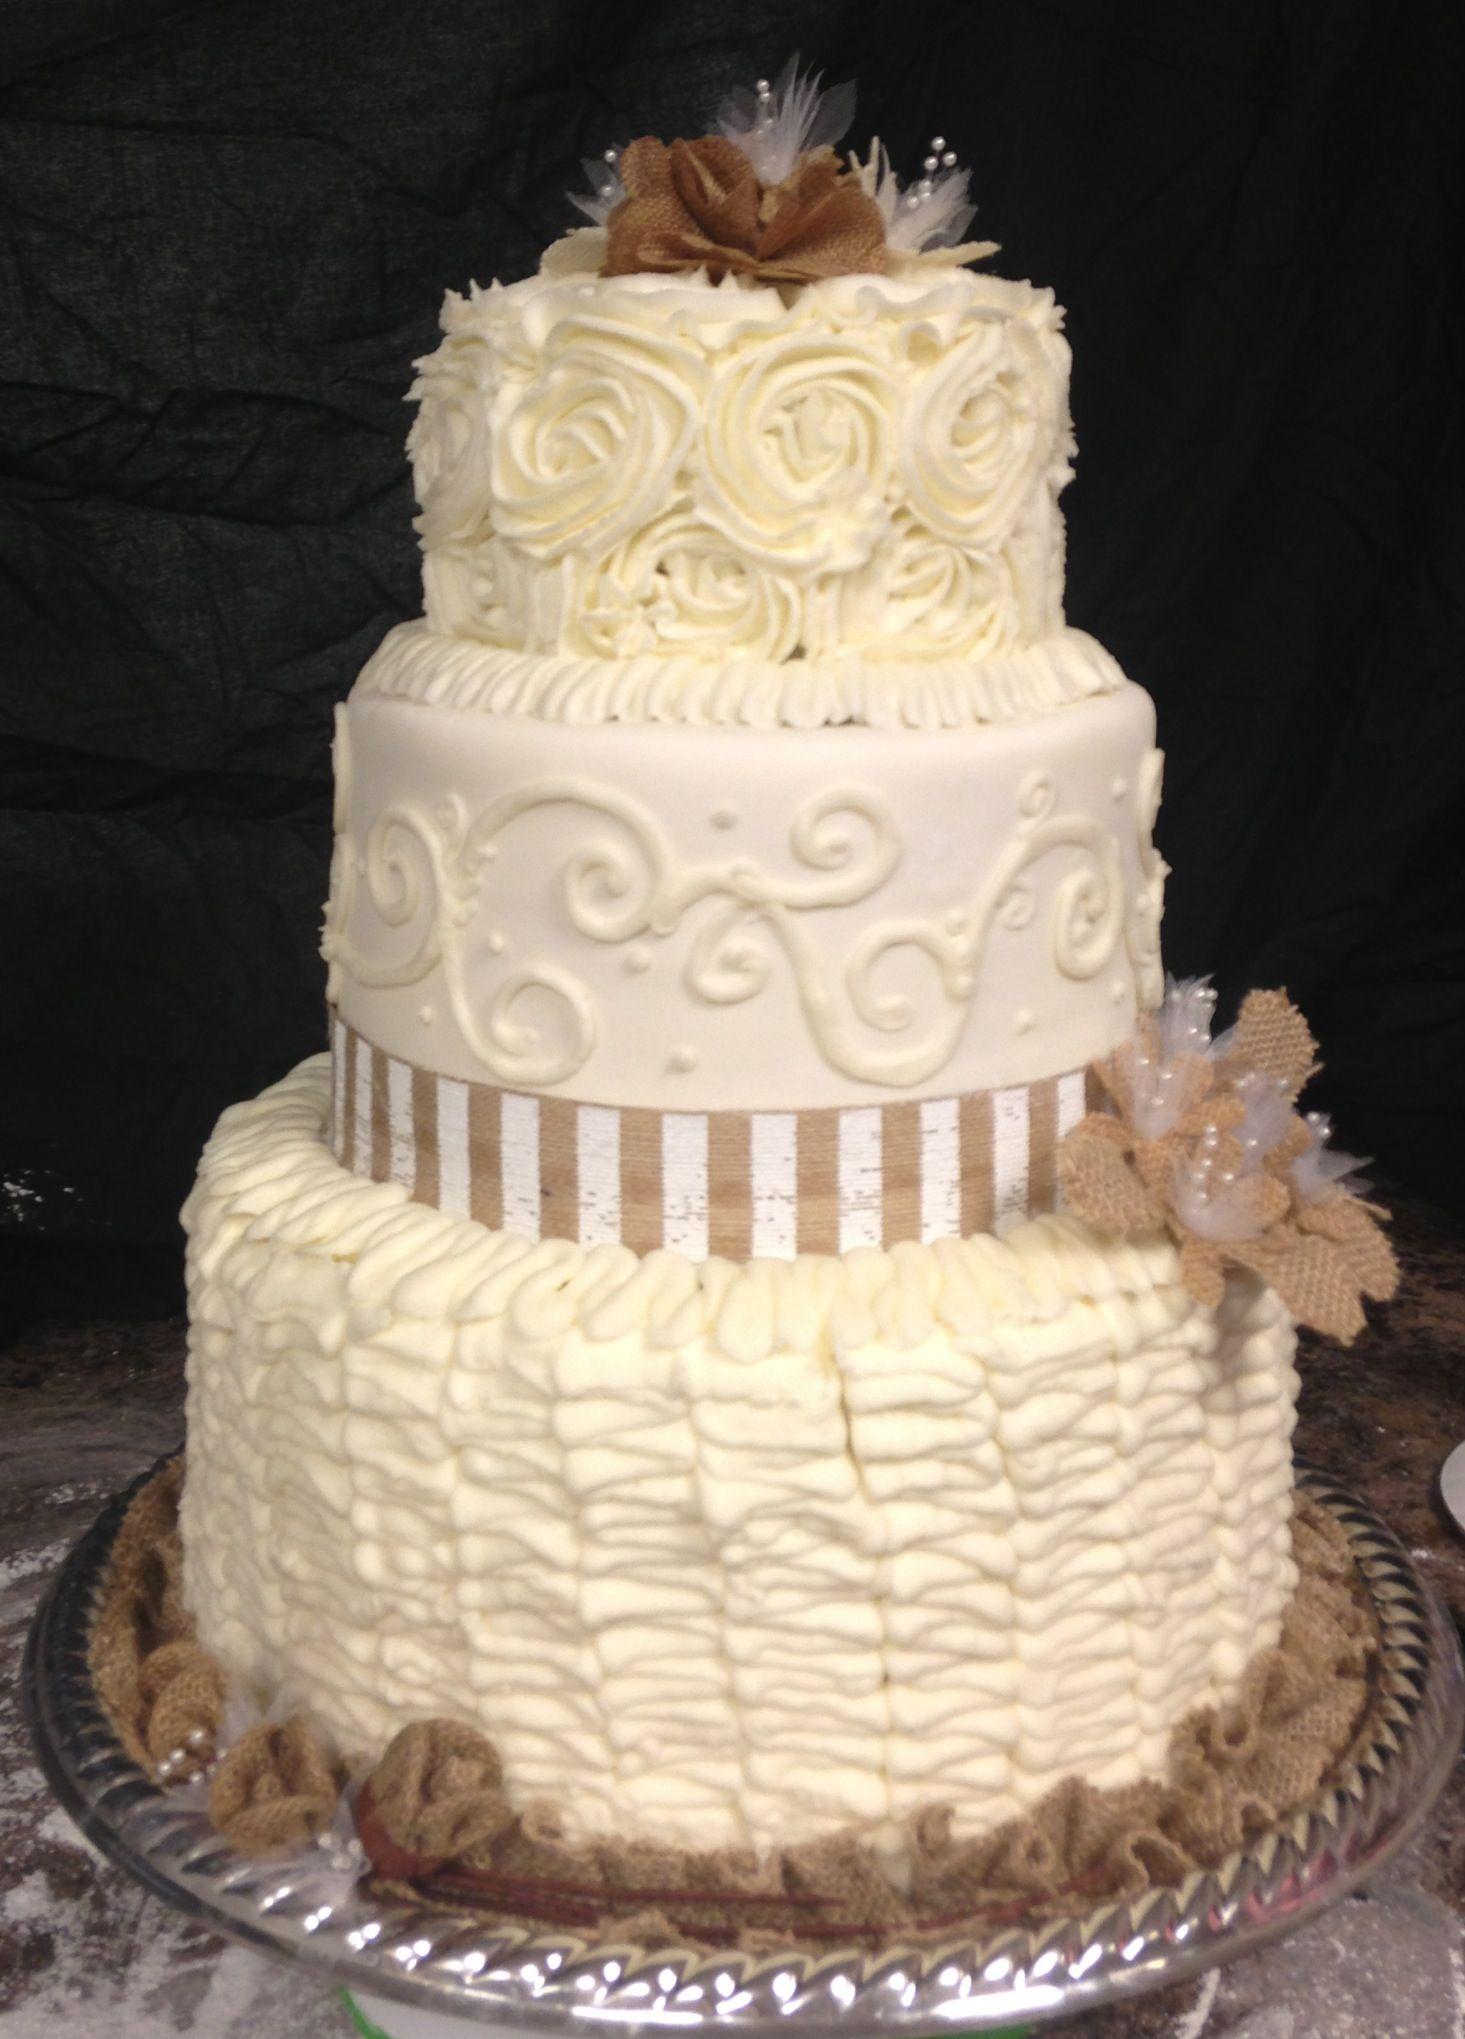 Burlap wedding cake | Burlap wedding cake, Cake, Burlap